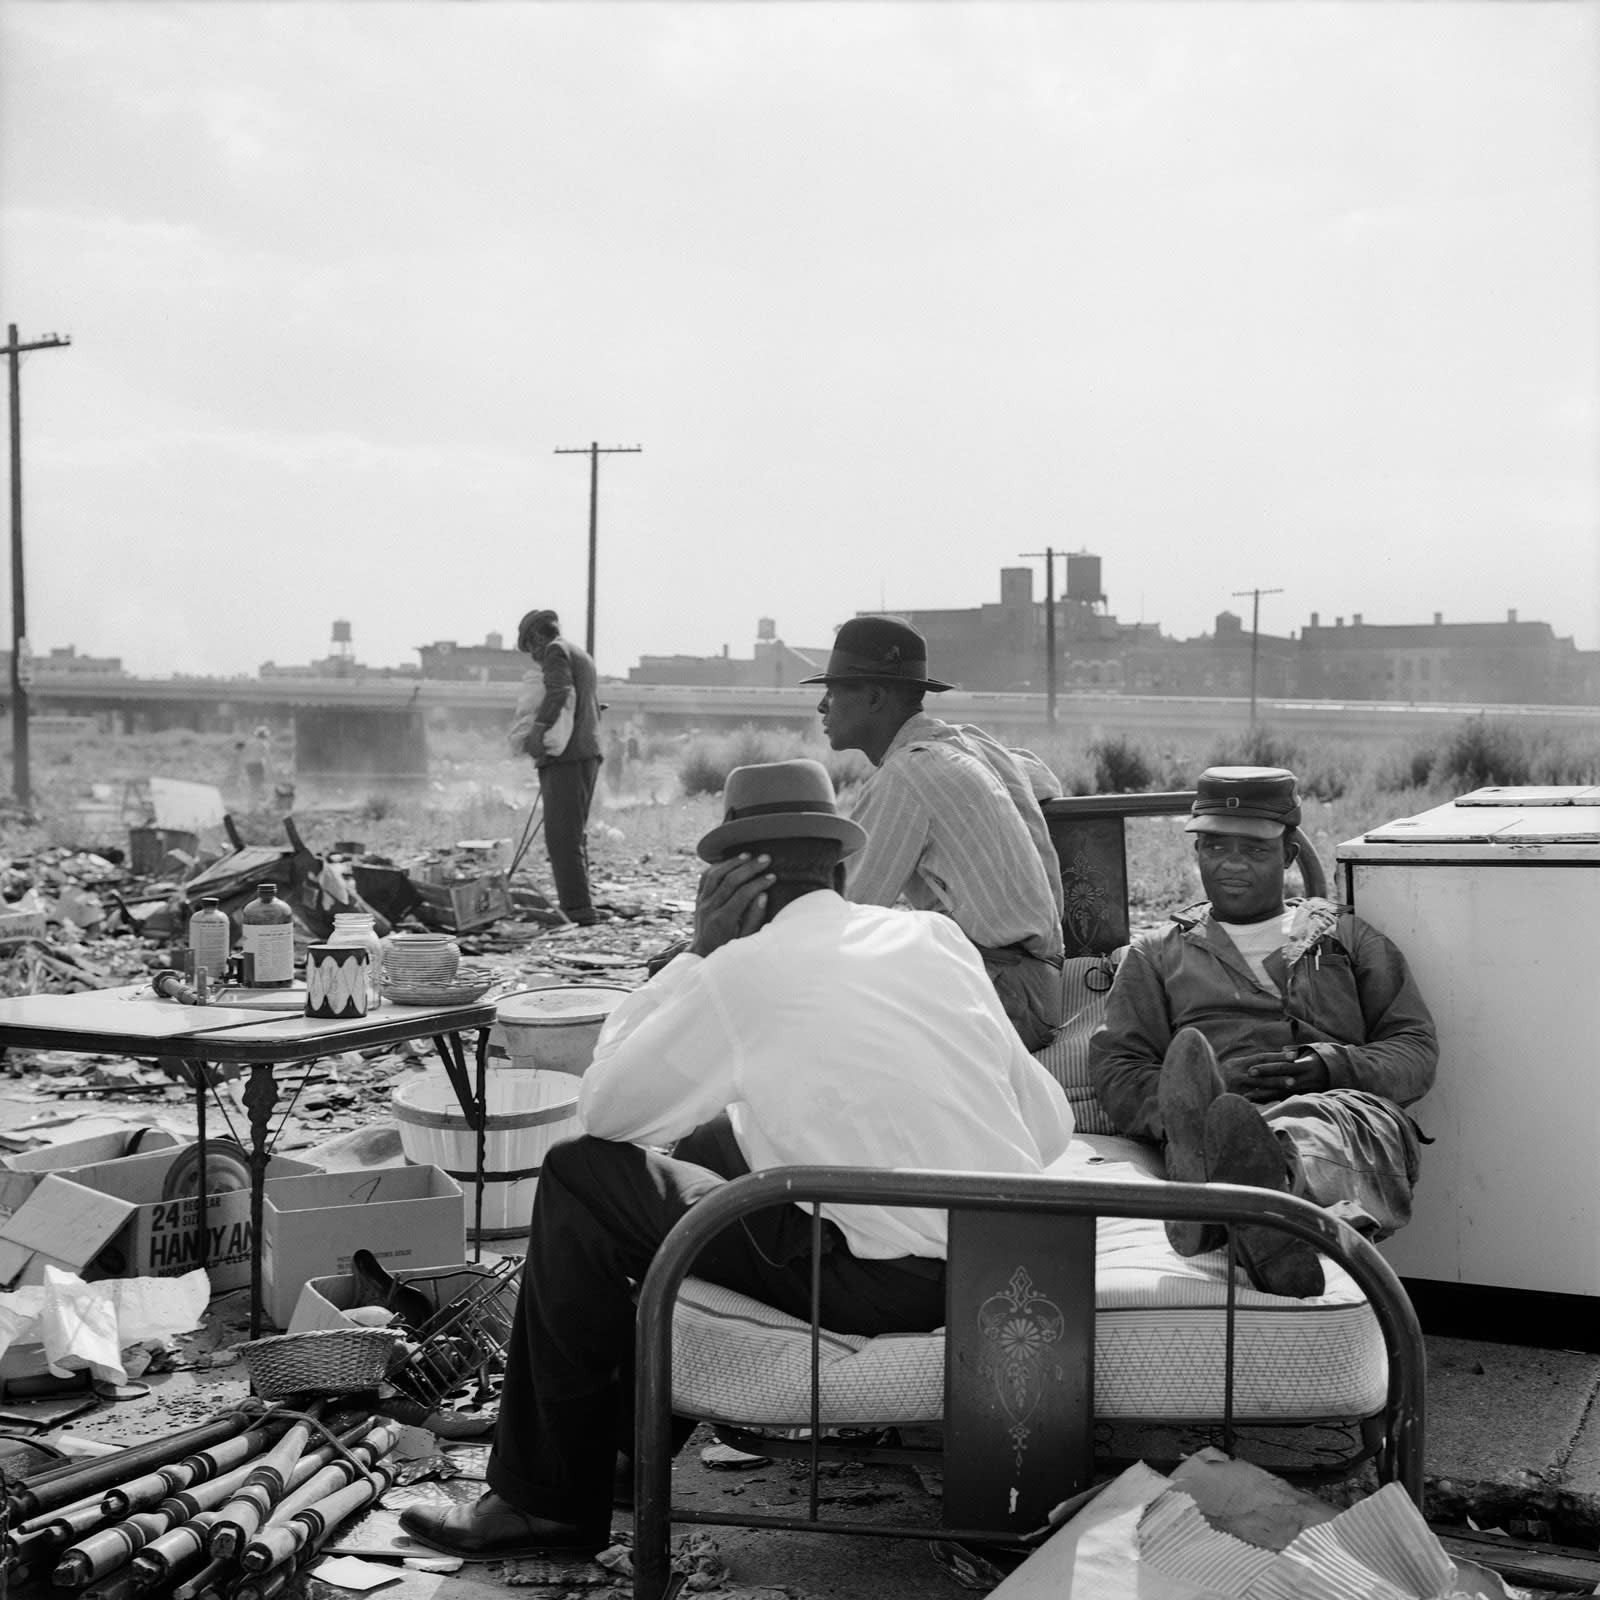 Vivian Maier, Maxwell Street, Chicago, IL, 1962